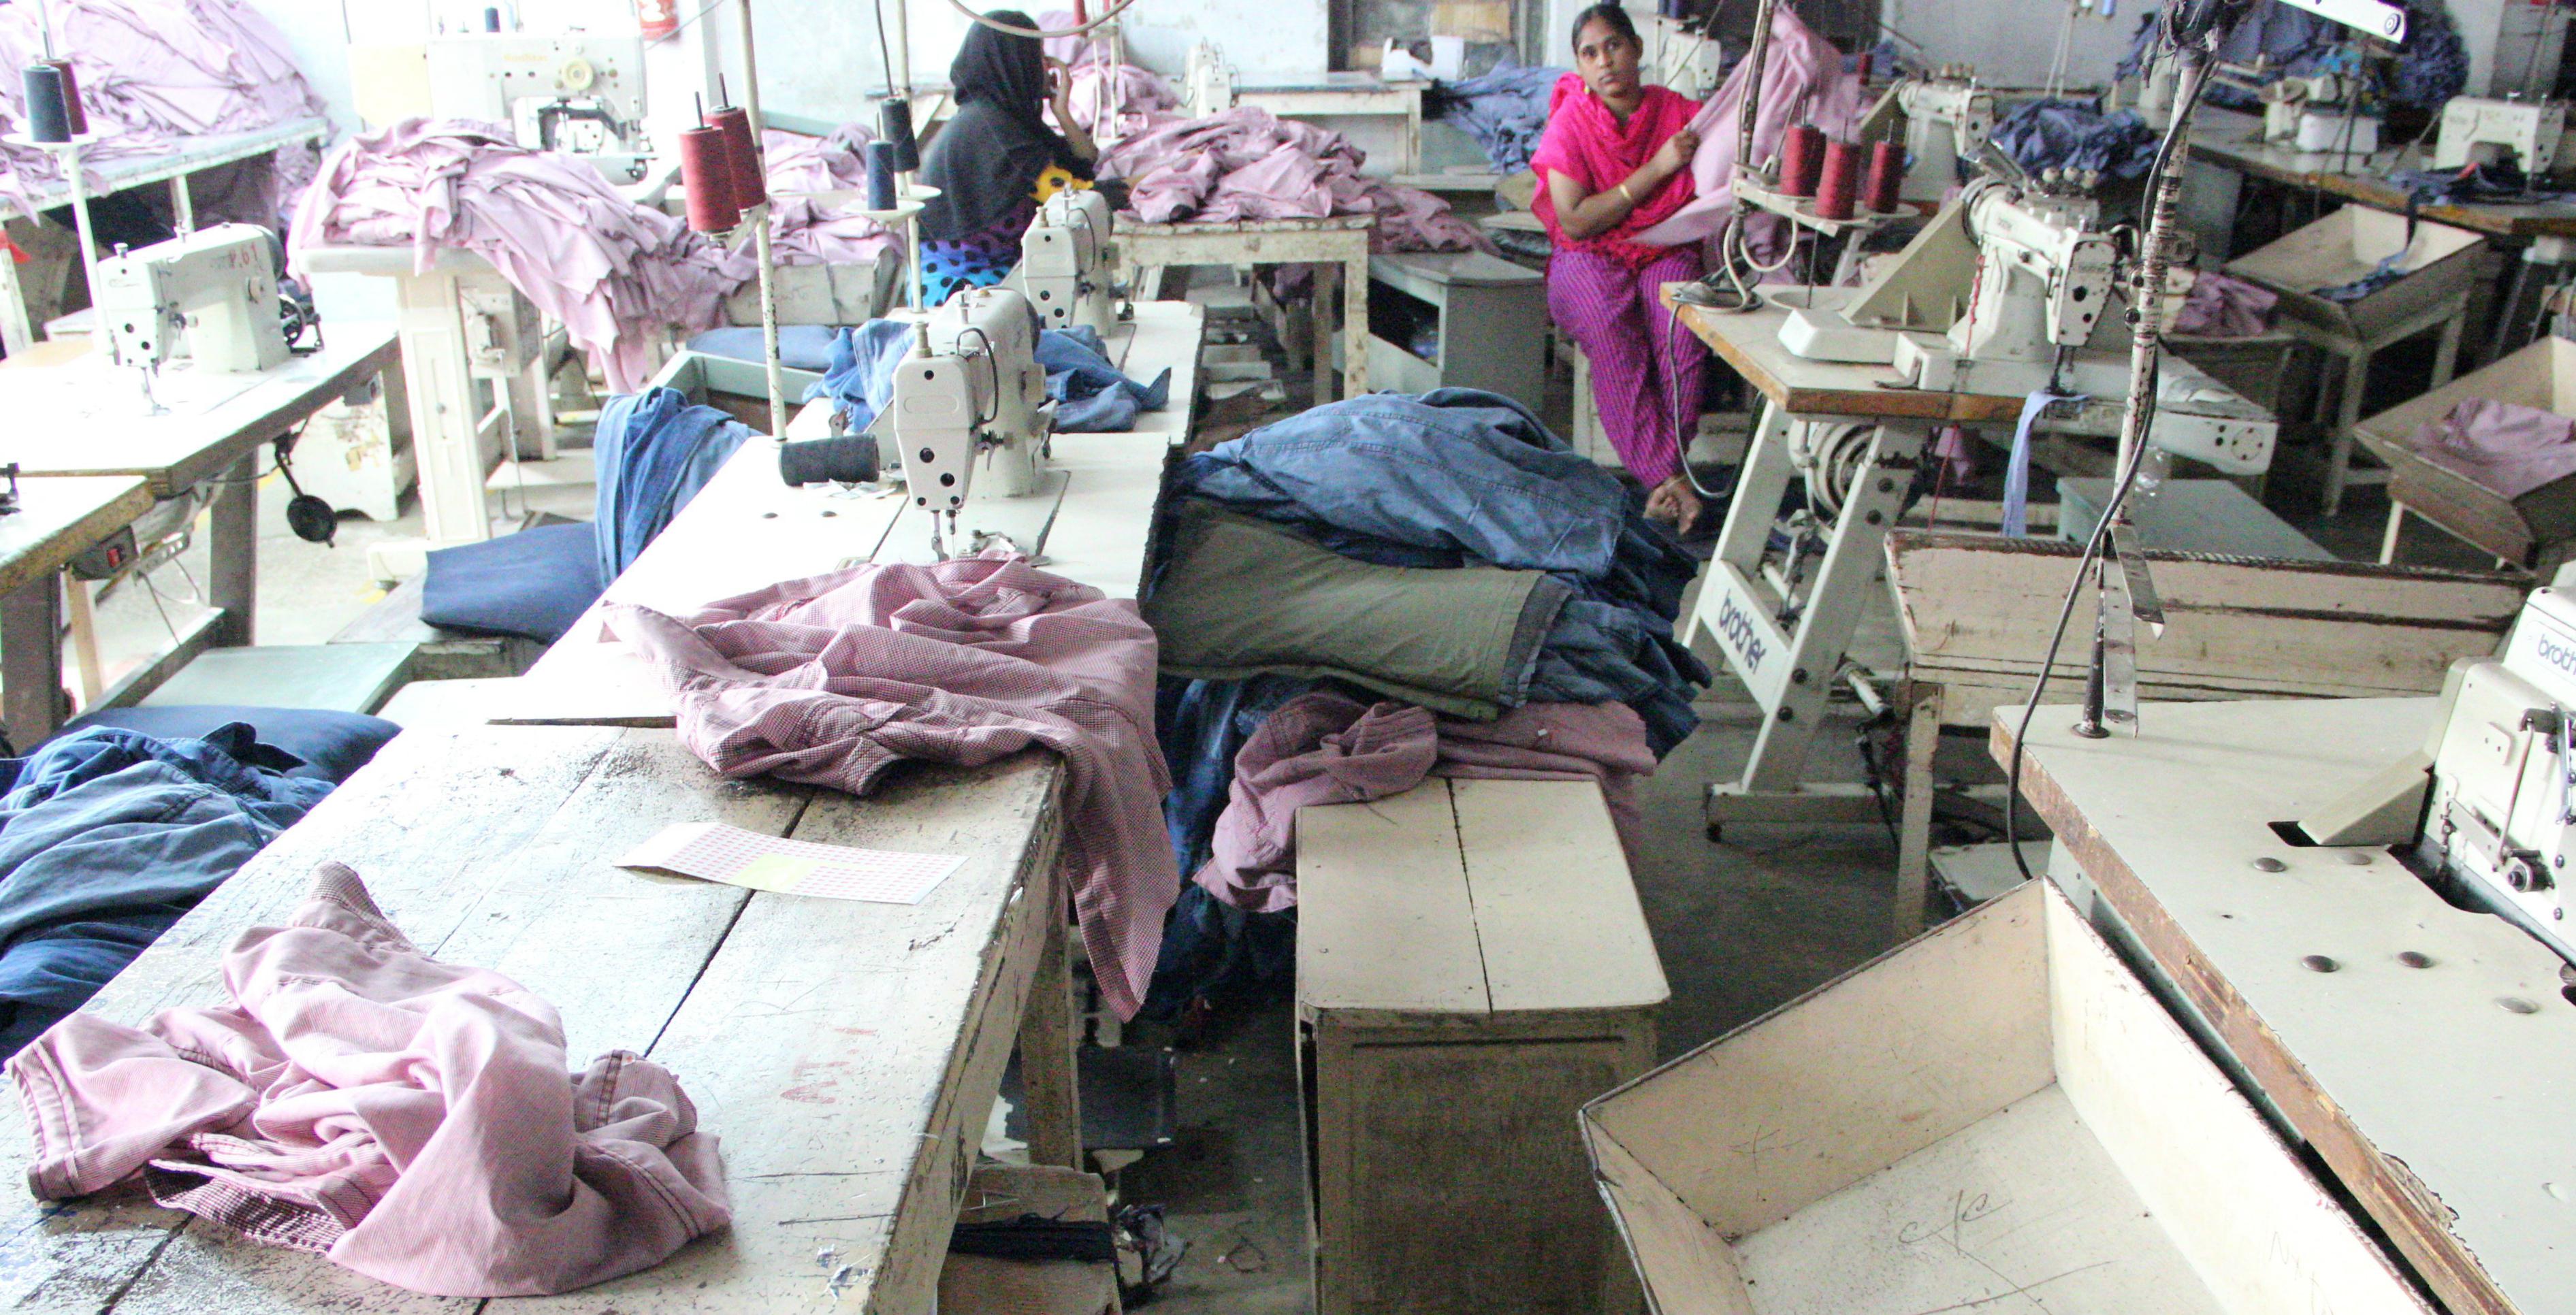 The way to start a real fashion revolution: put Bangladesh's